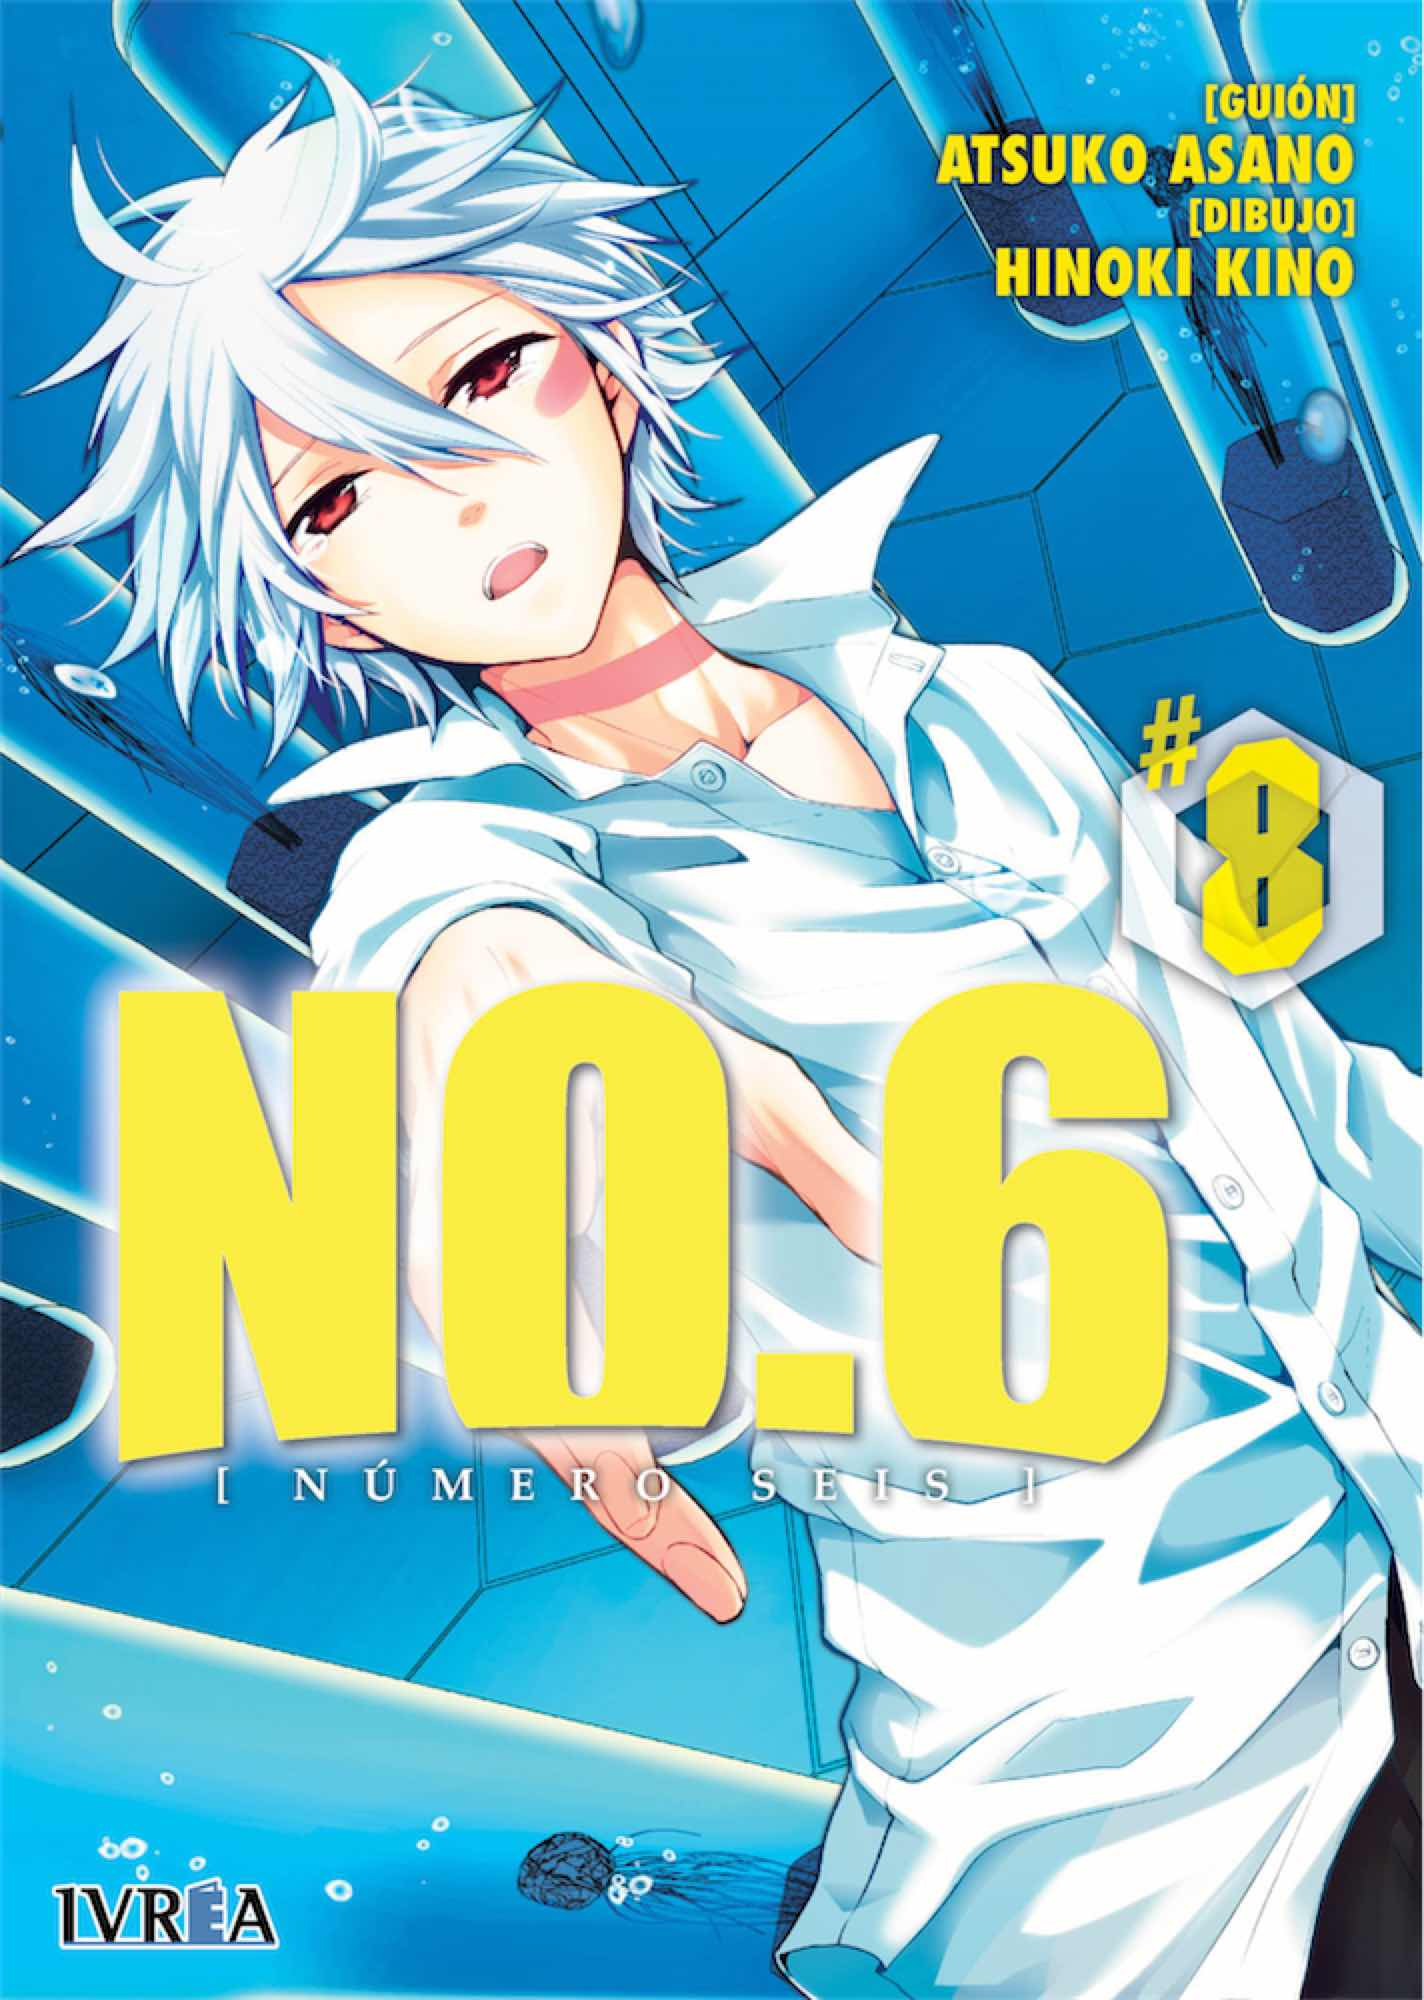 NO.6 08 (NUMERO SEIS) COMIC)